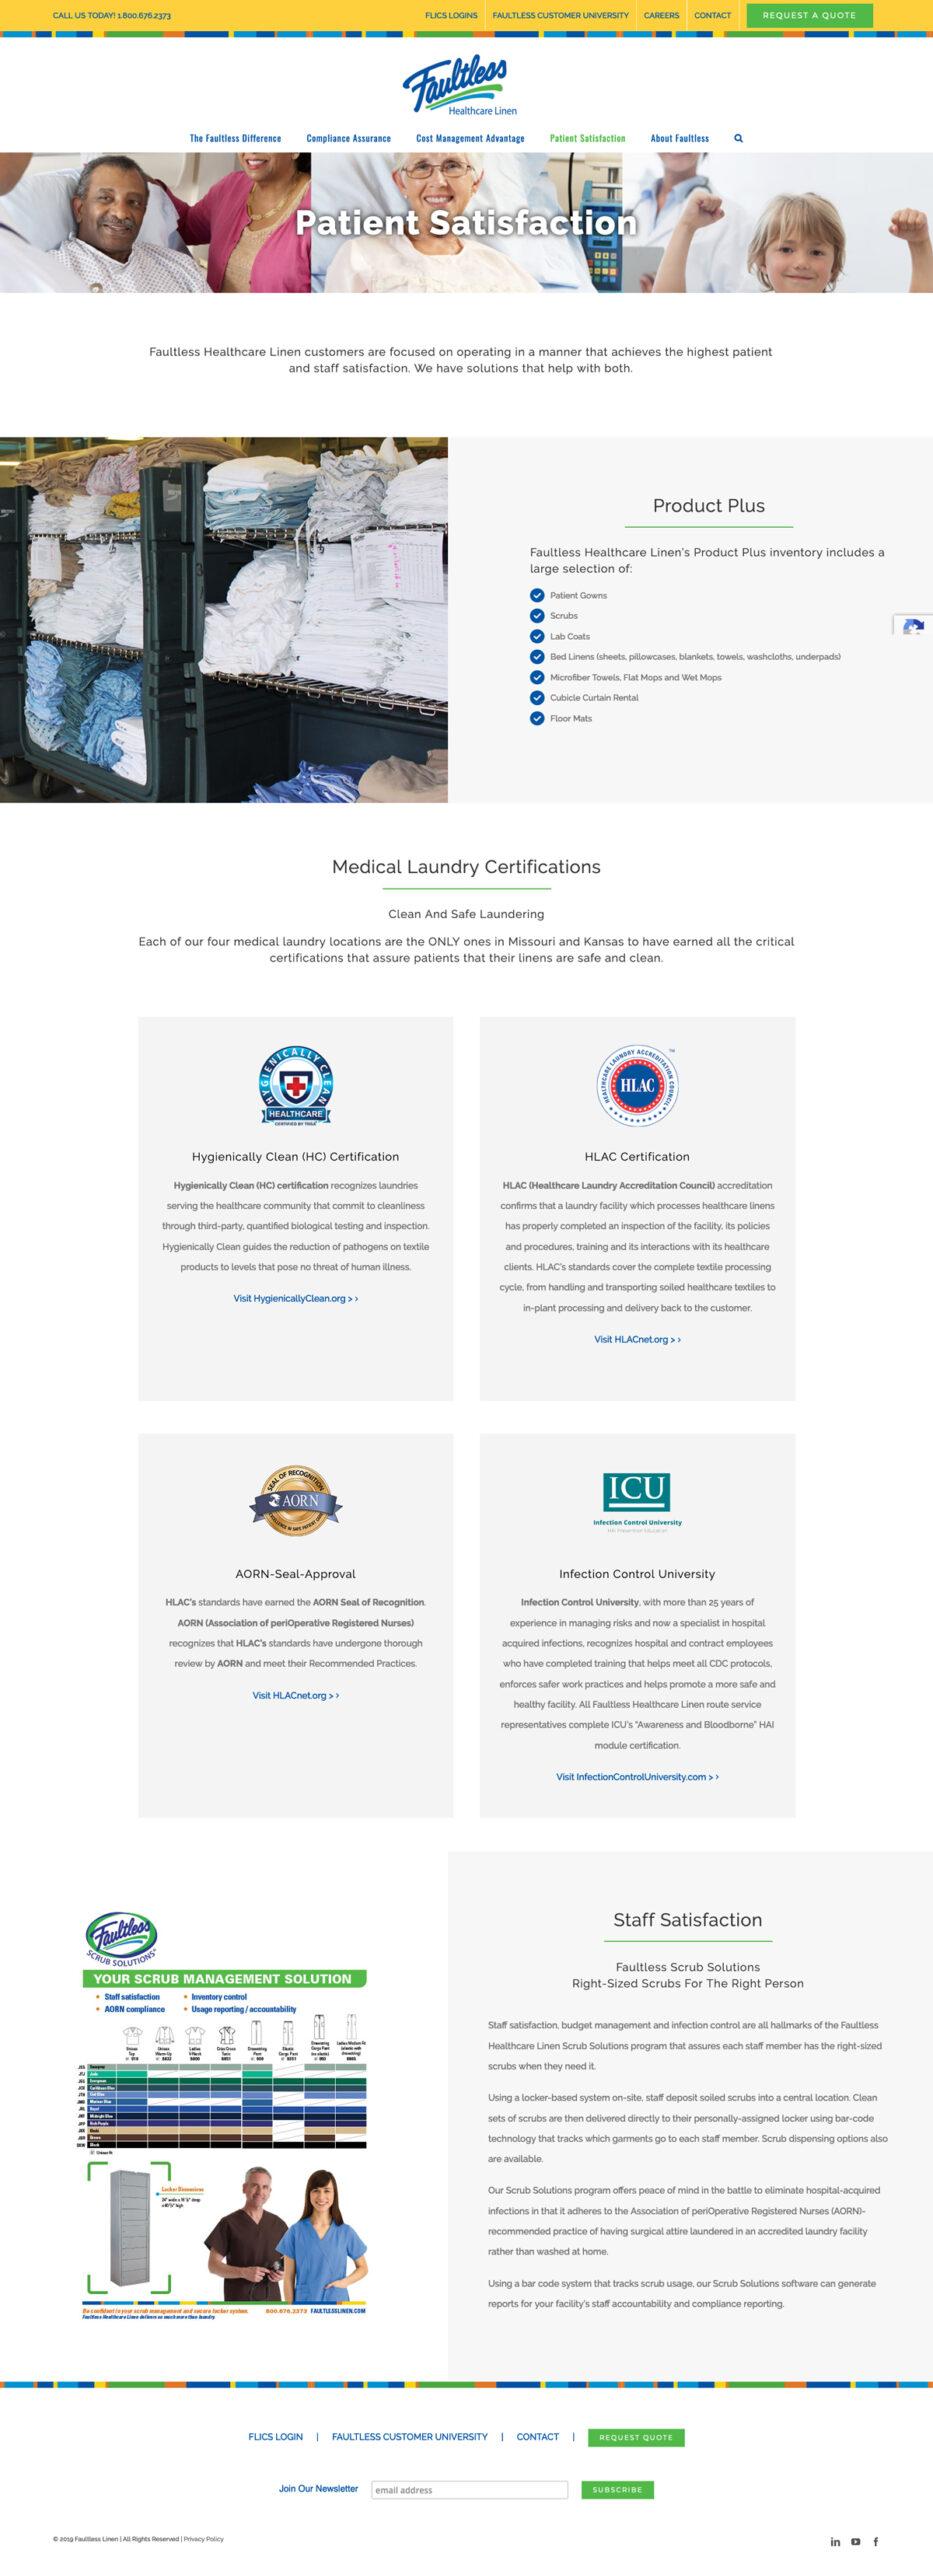 Company Website Design for Faultless Healthcare Linen Patient Satisfation